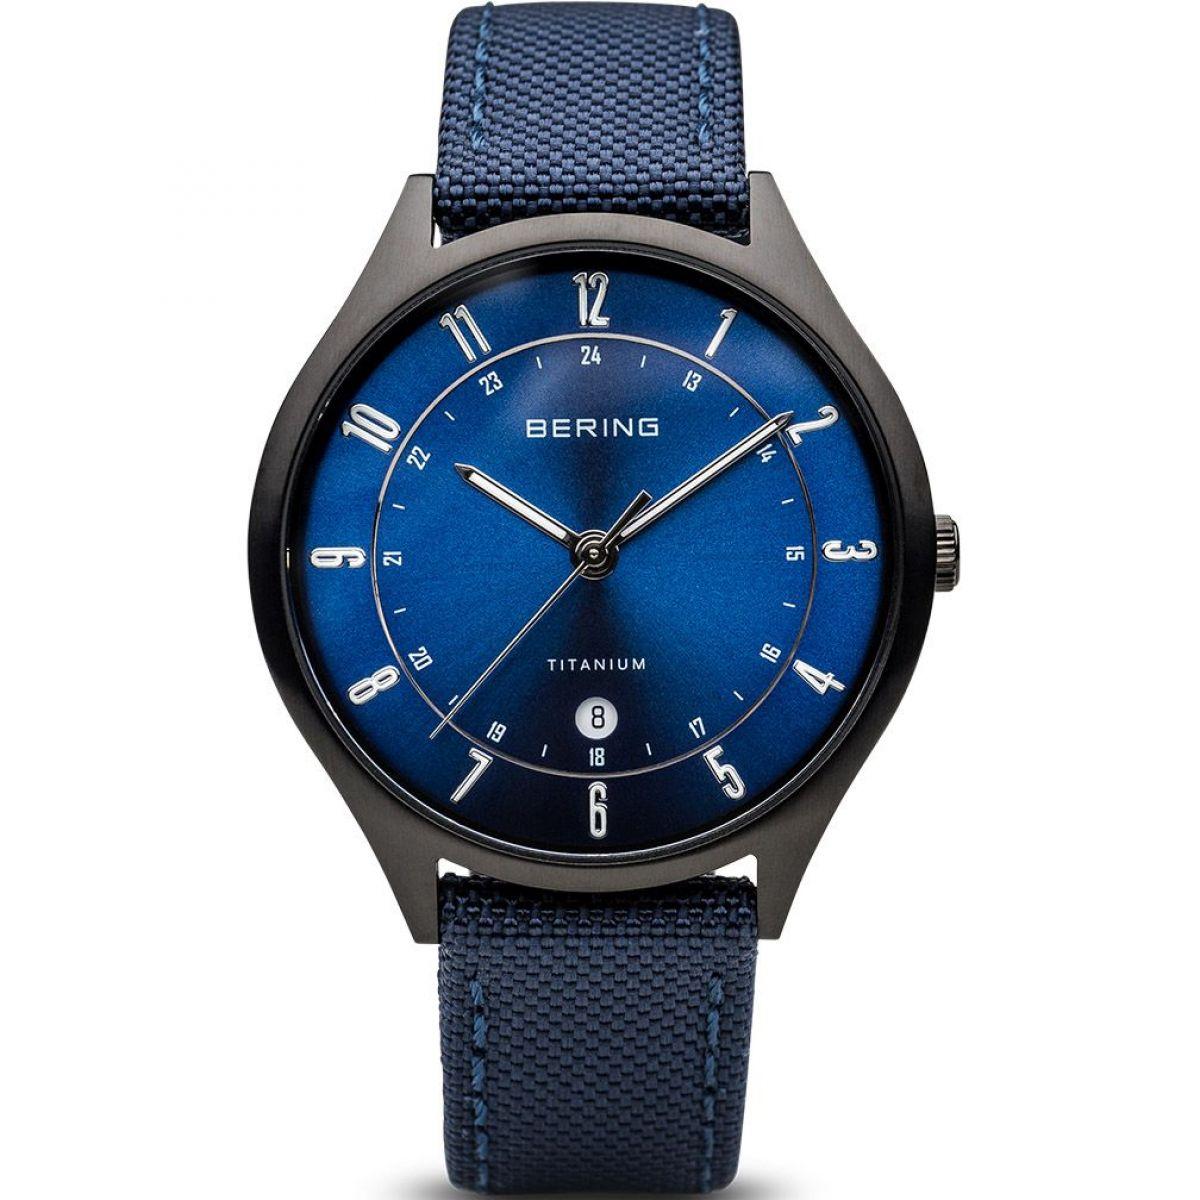 Zegarki Bering w super cenach